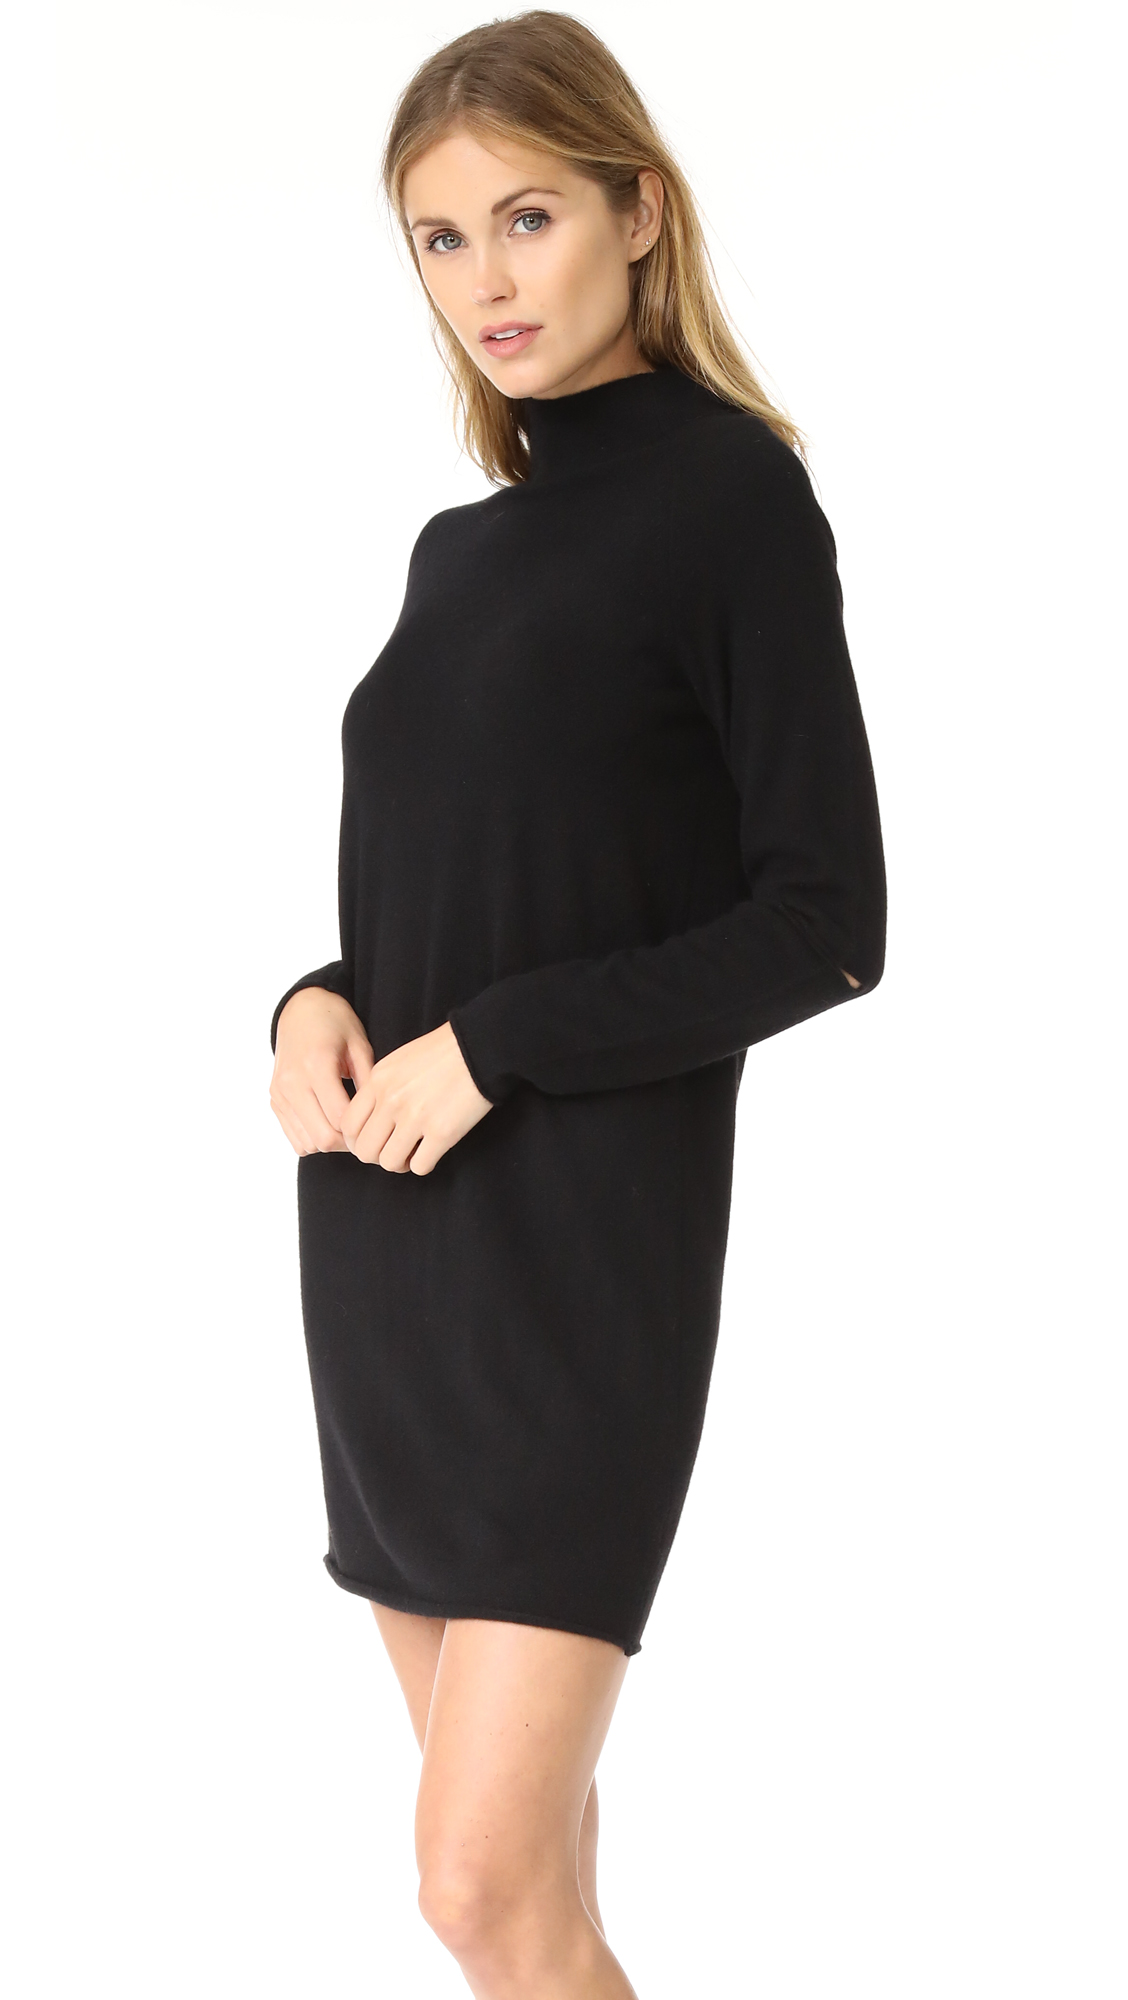 6df5a8d8eb 360 SWEATER Lynx Cashmere Sweater Dress